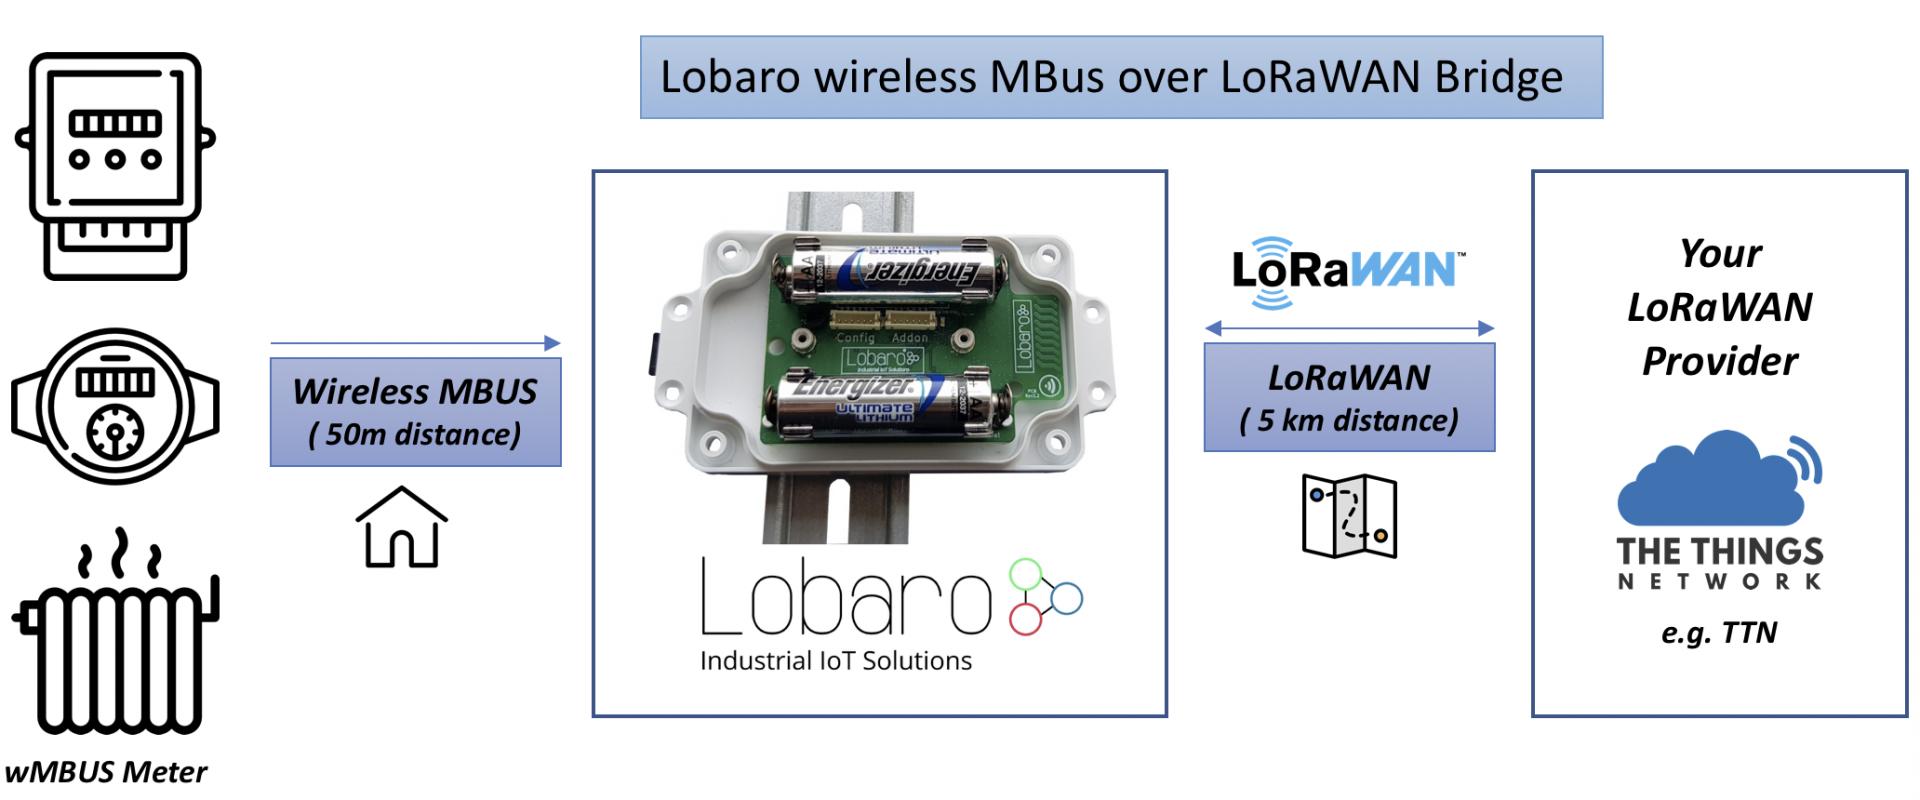 wireless MBUS over LoRaWAN / LPWAN Bridge Systemoverview